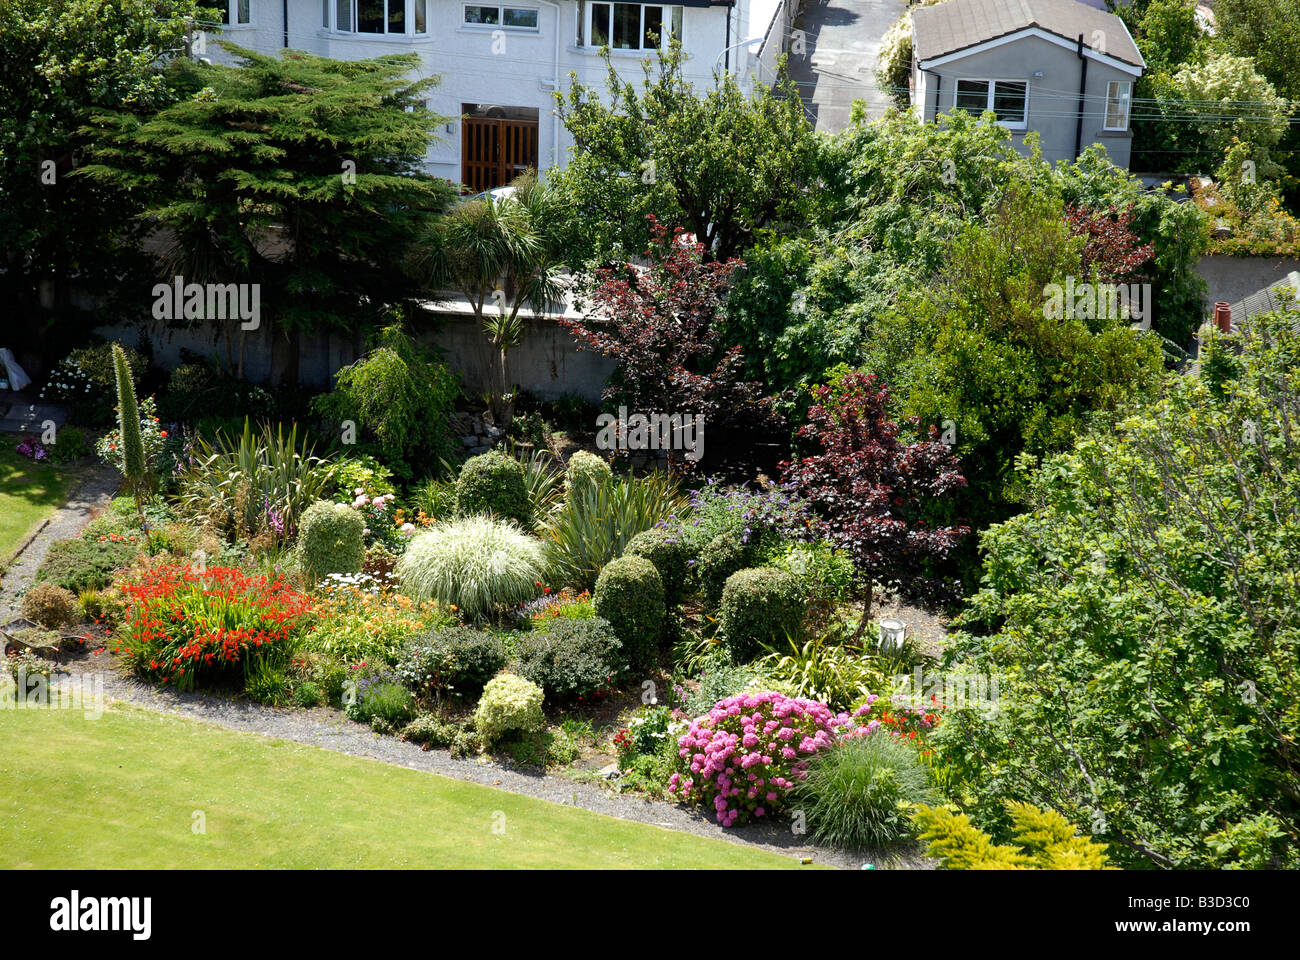 Garden at Sandycove Irish sea Co Dublin Ireland - Stock Image